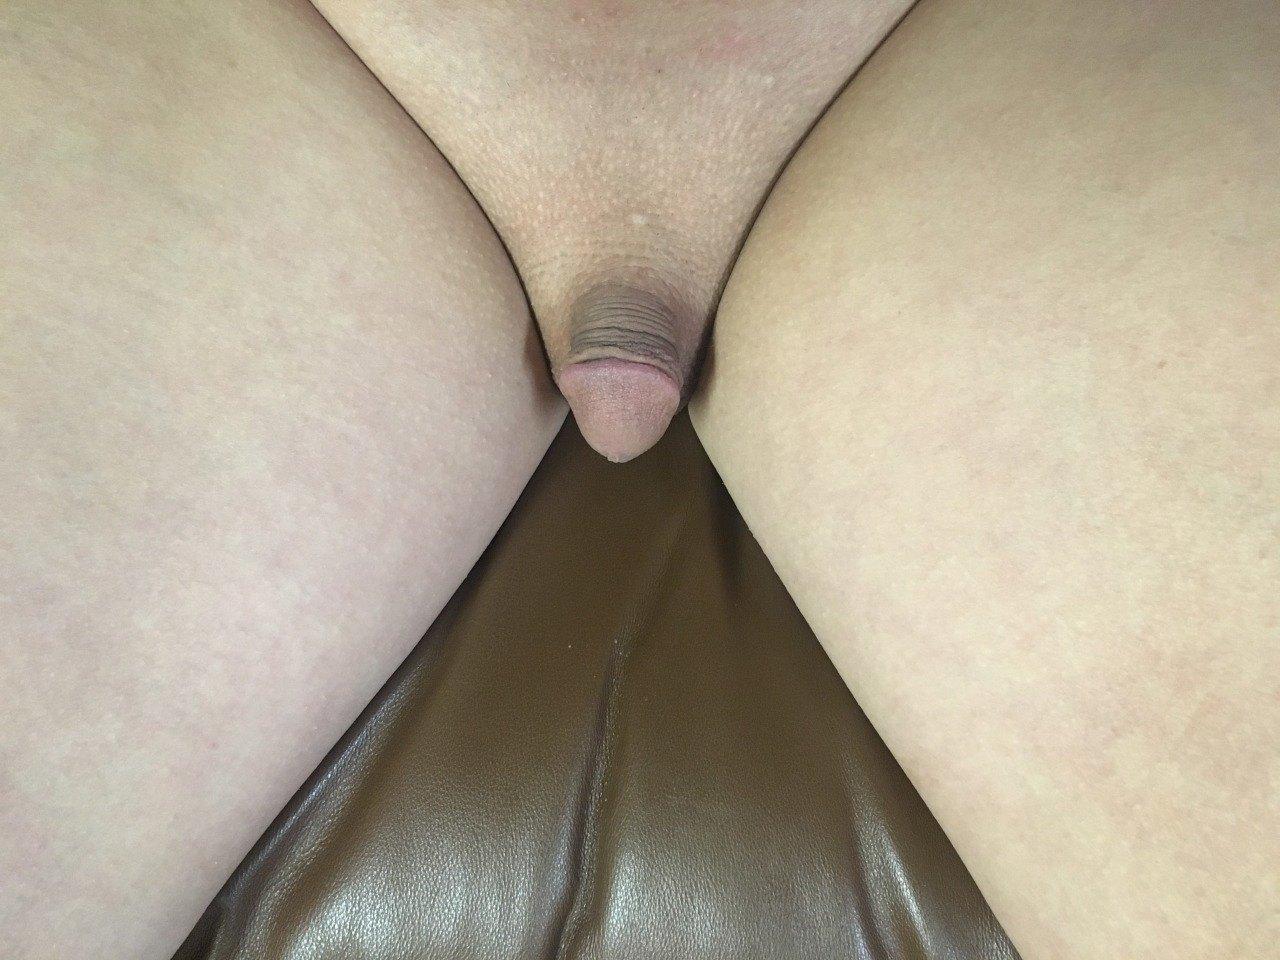 Tranny Cumming While Fucked